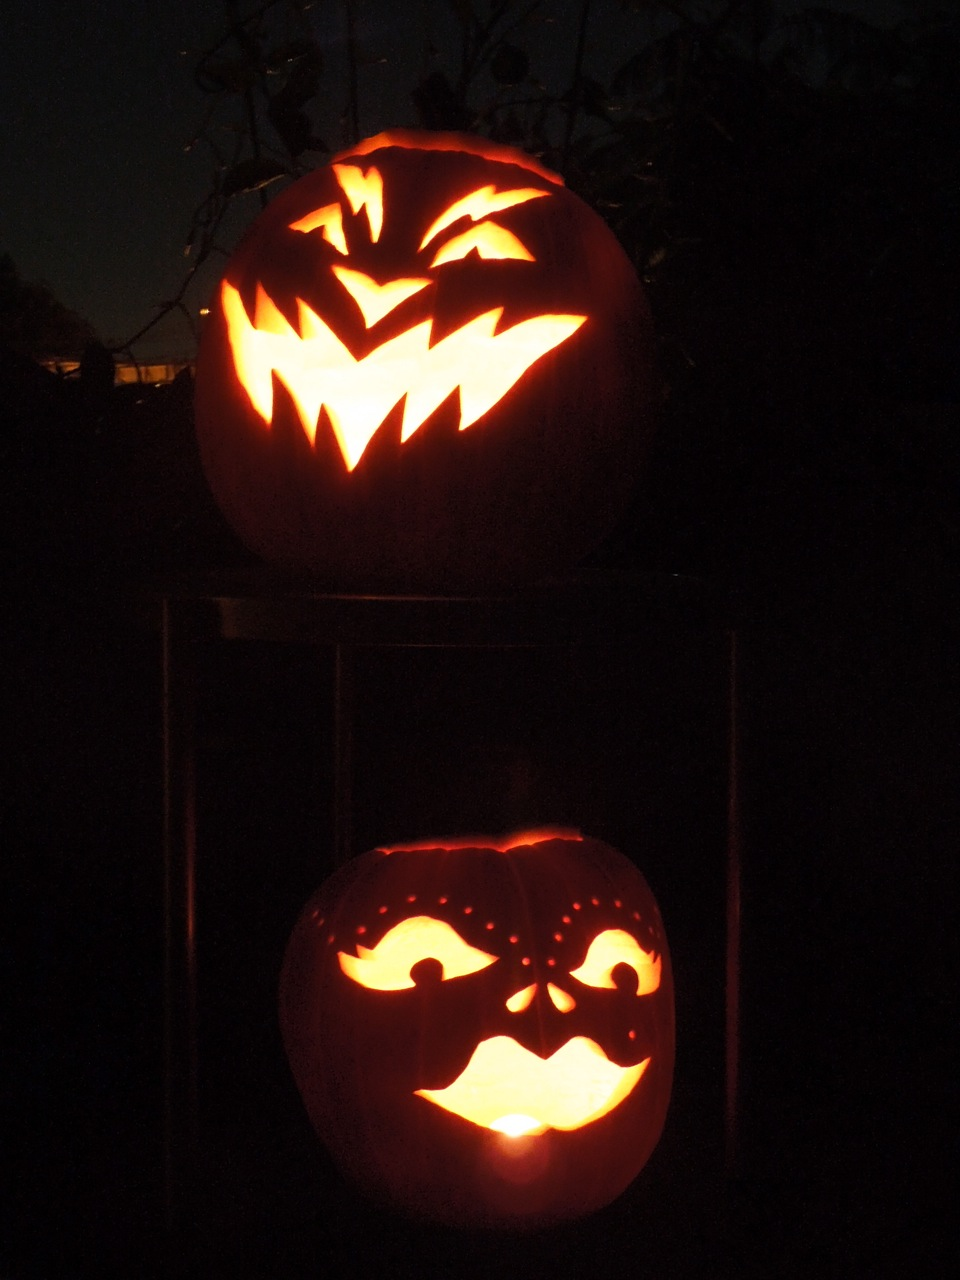 Love Pumpkin Carving Carved Halloween Pumpkins